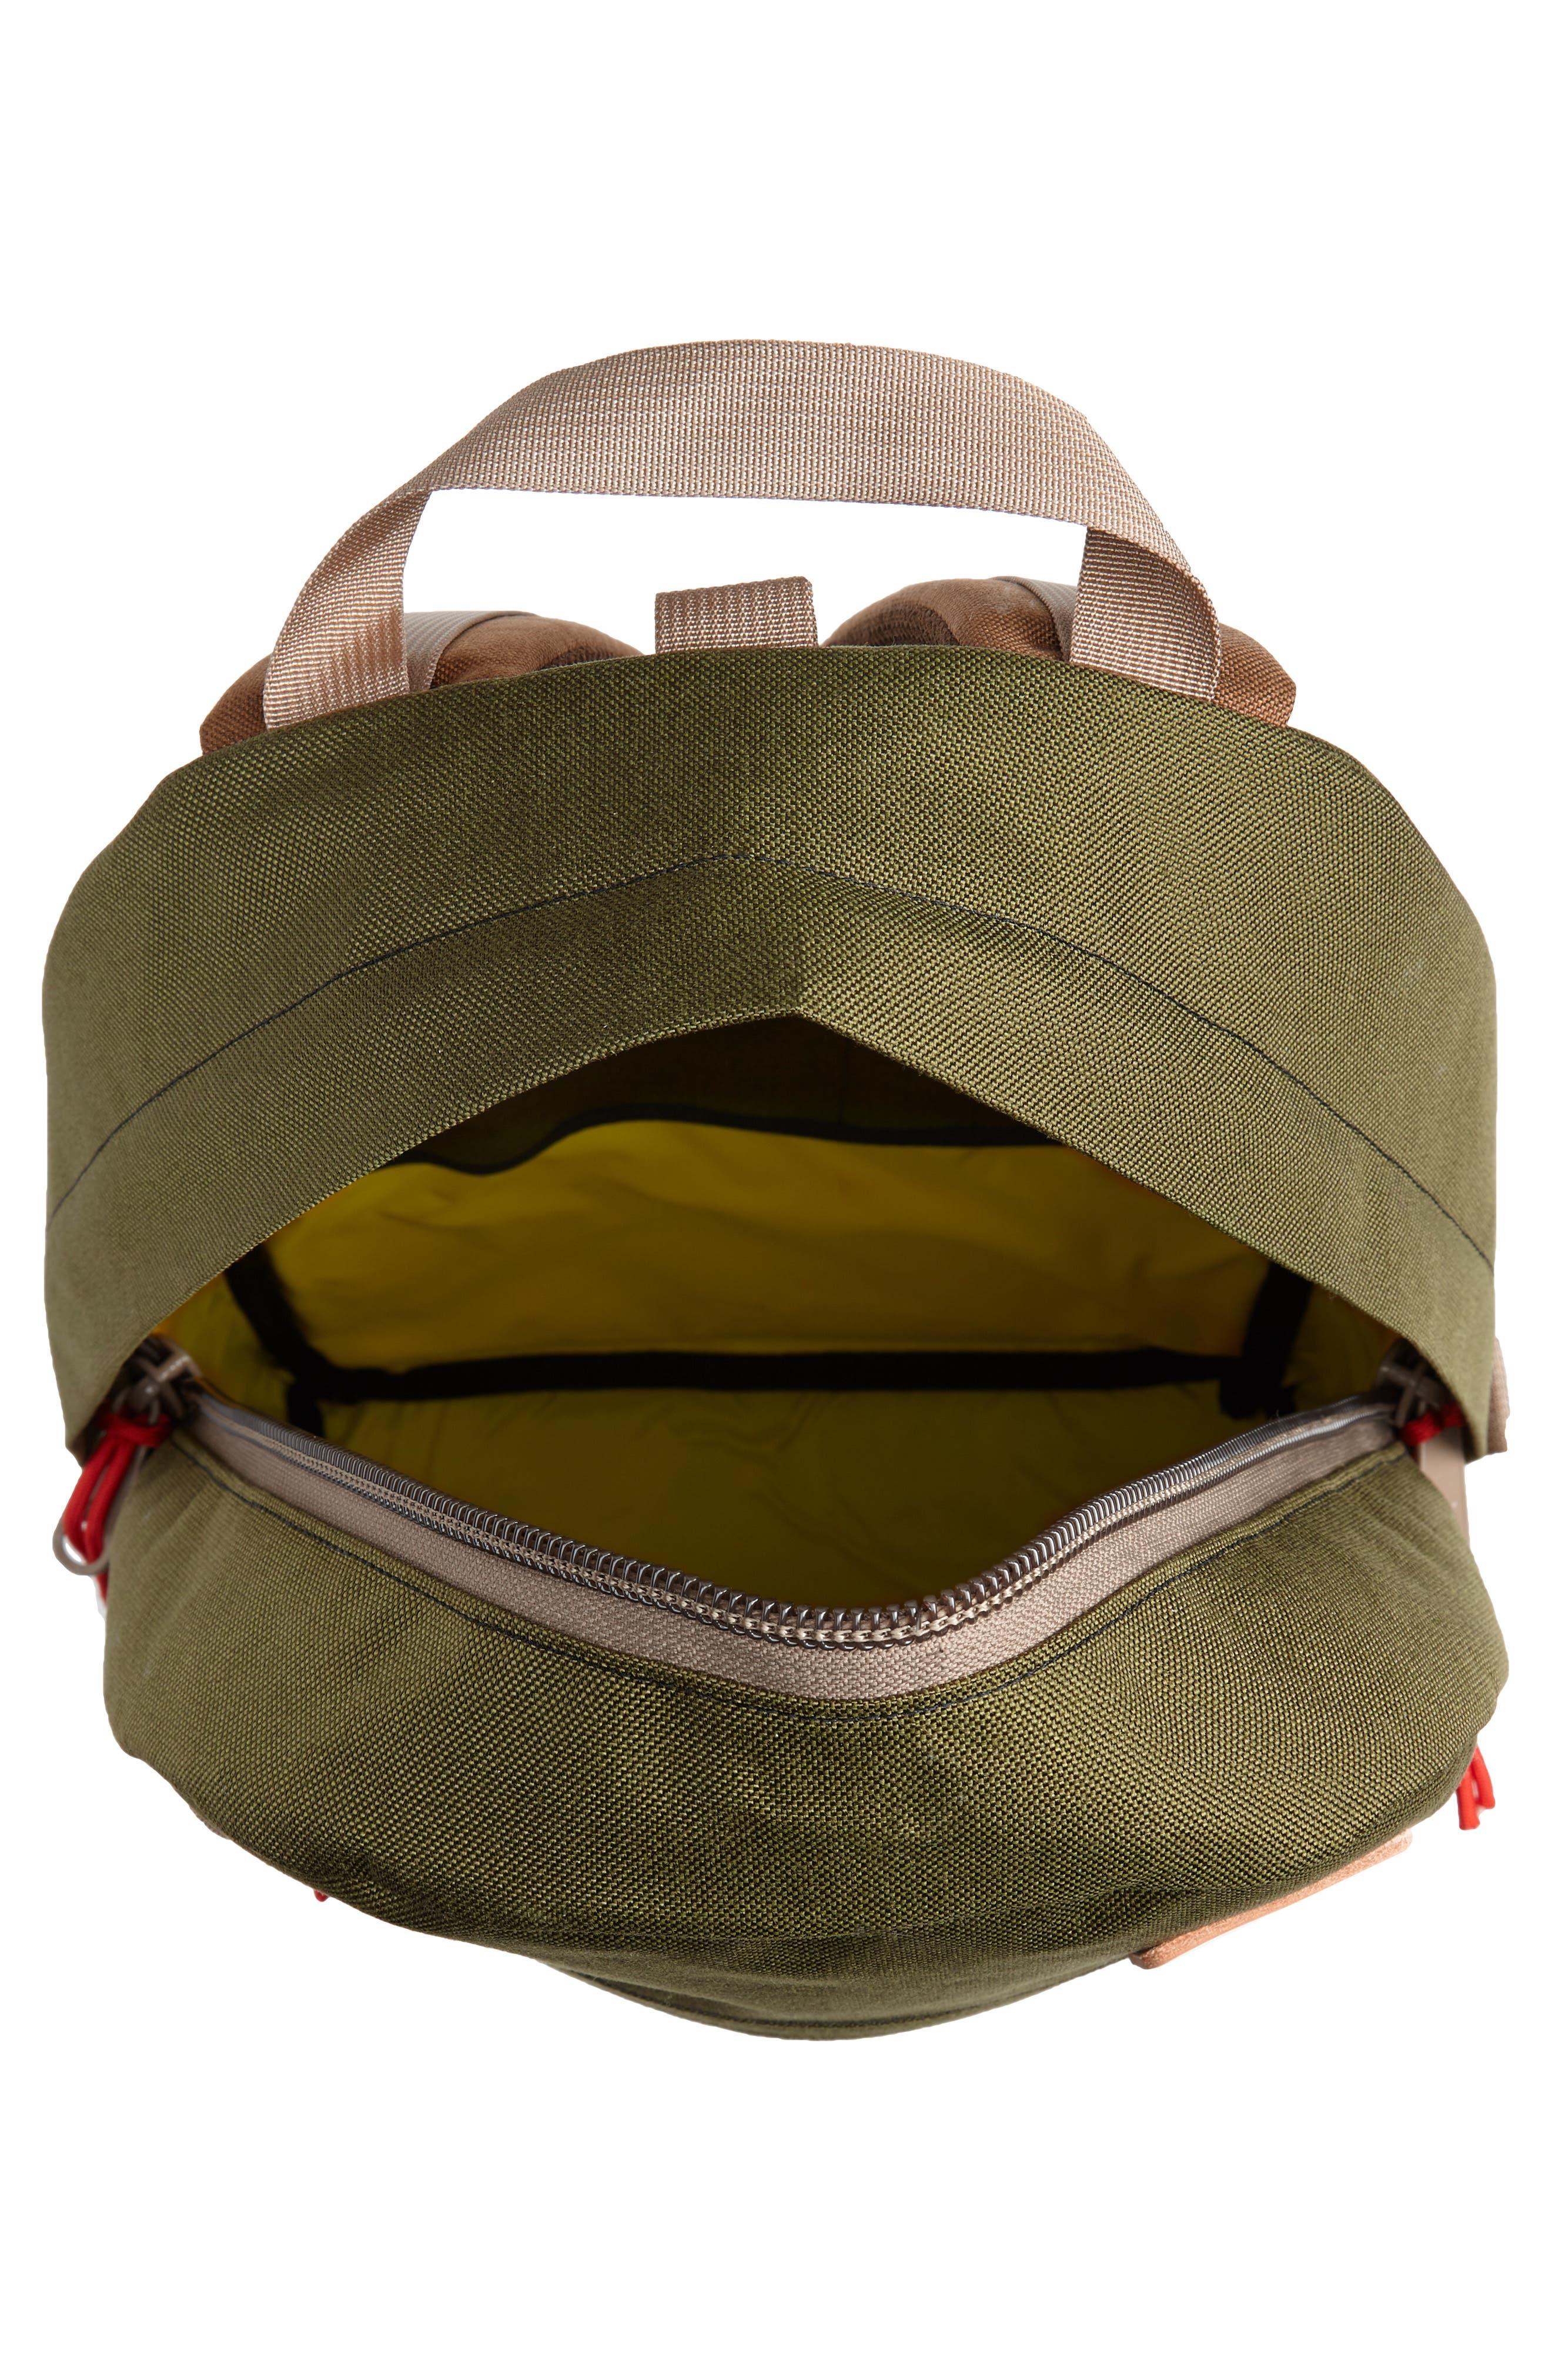 Daypack,                             Alternate thumbnail 4, color,                             OLIVE